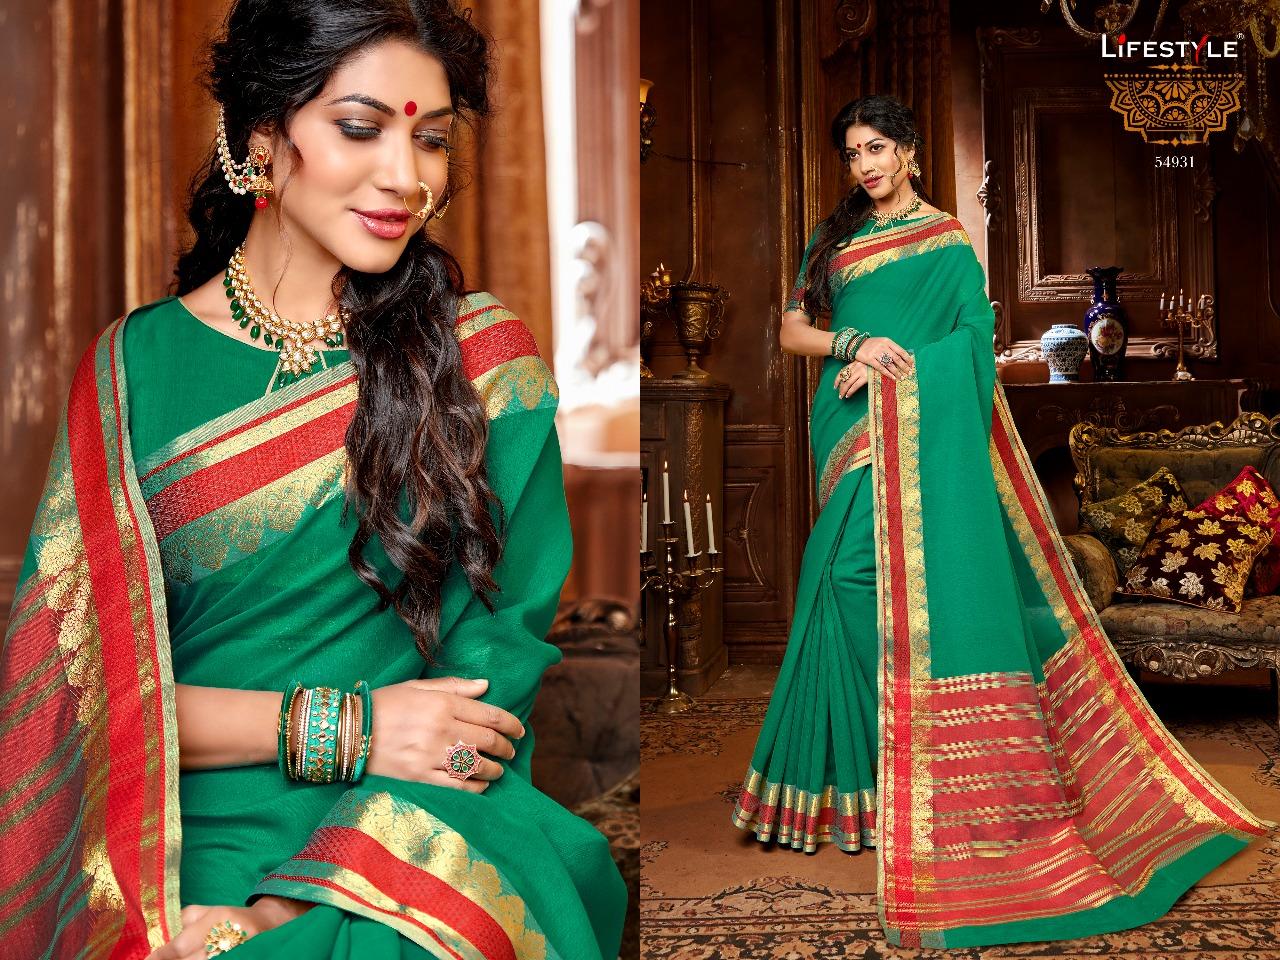 Lifestyle Khadi Silk 54931